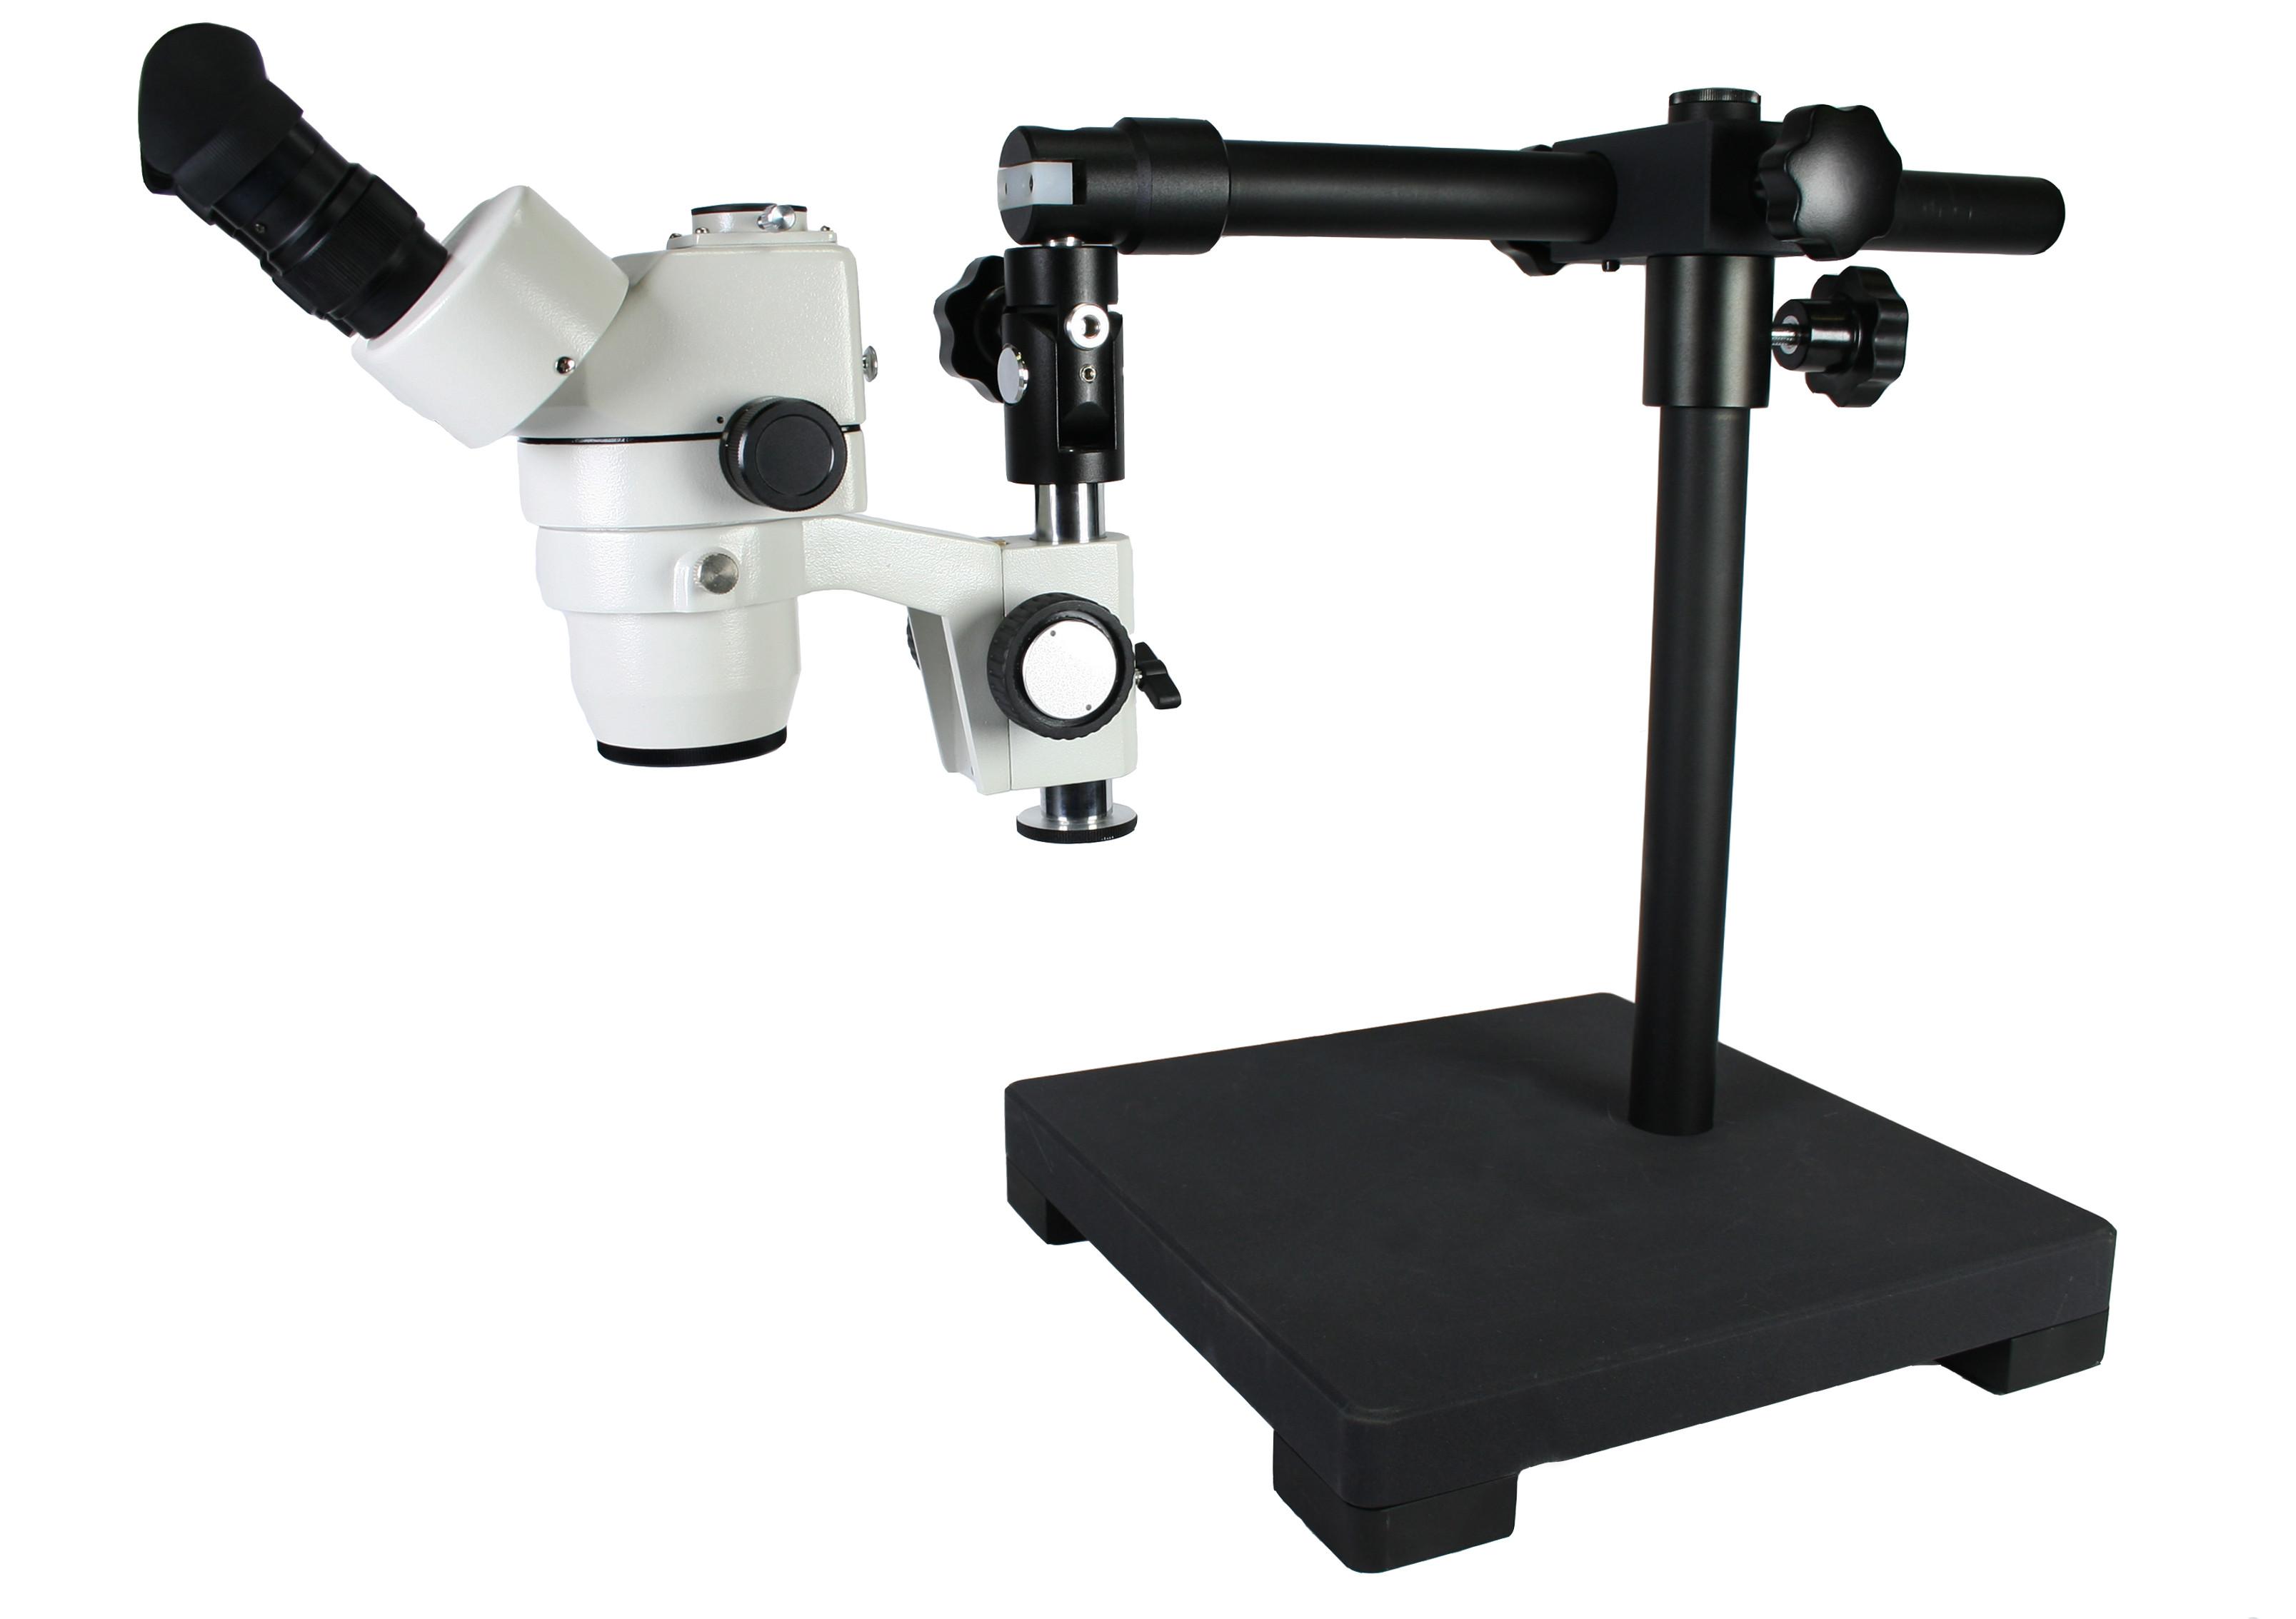 Educational Trinocular Stereo Zoom (1X-4X) Microscope